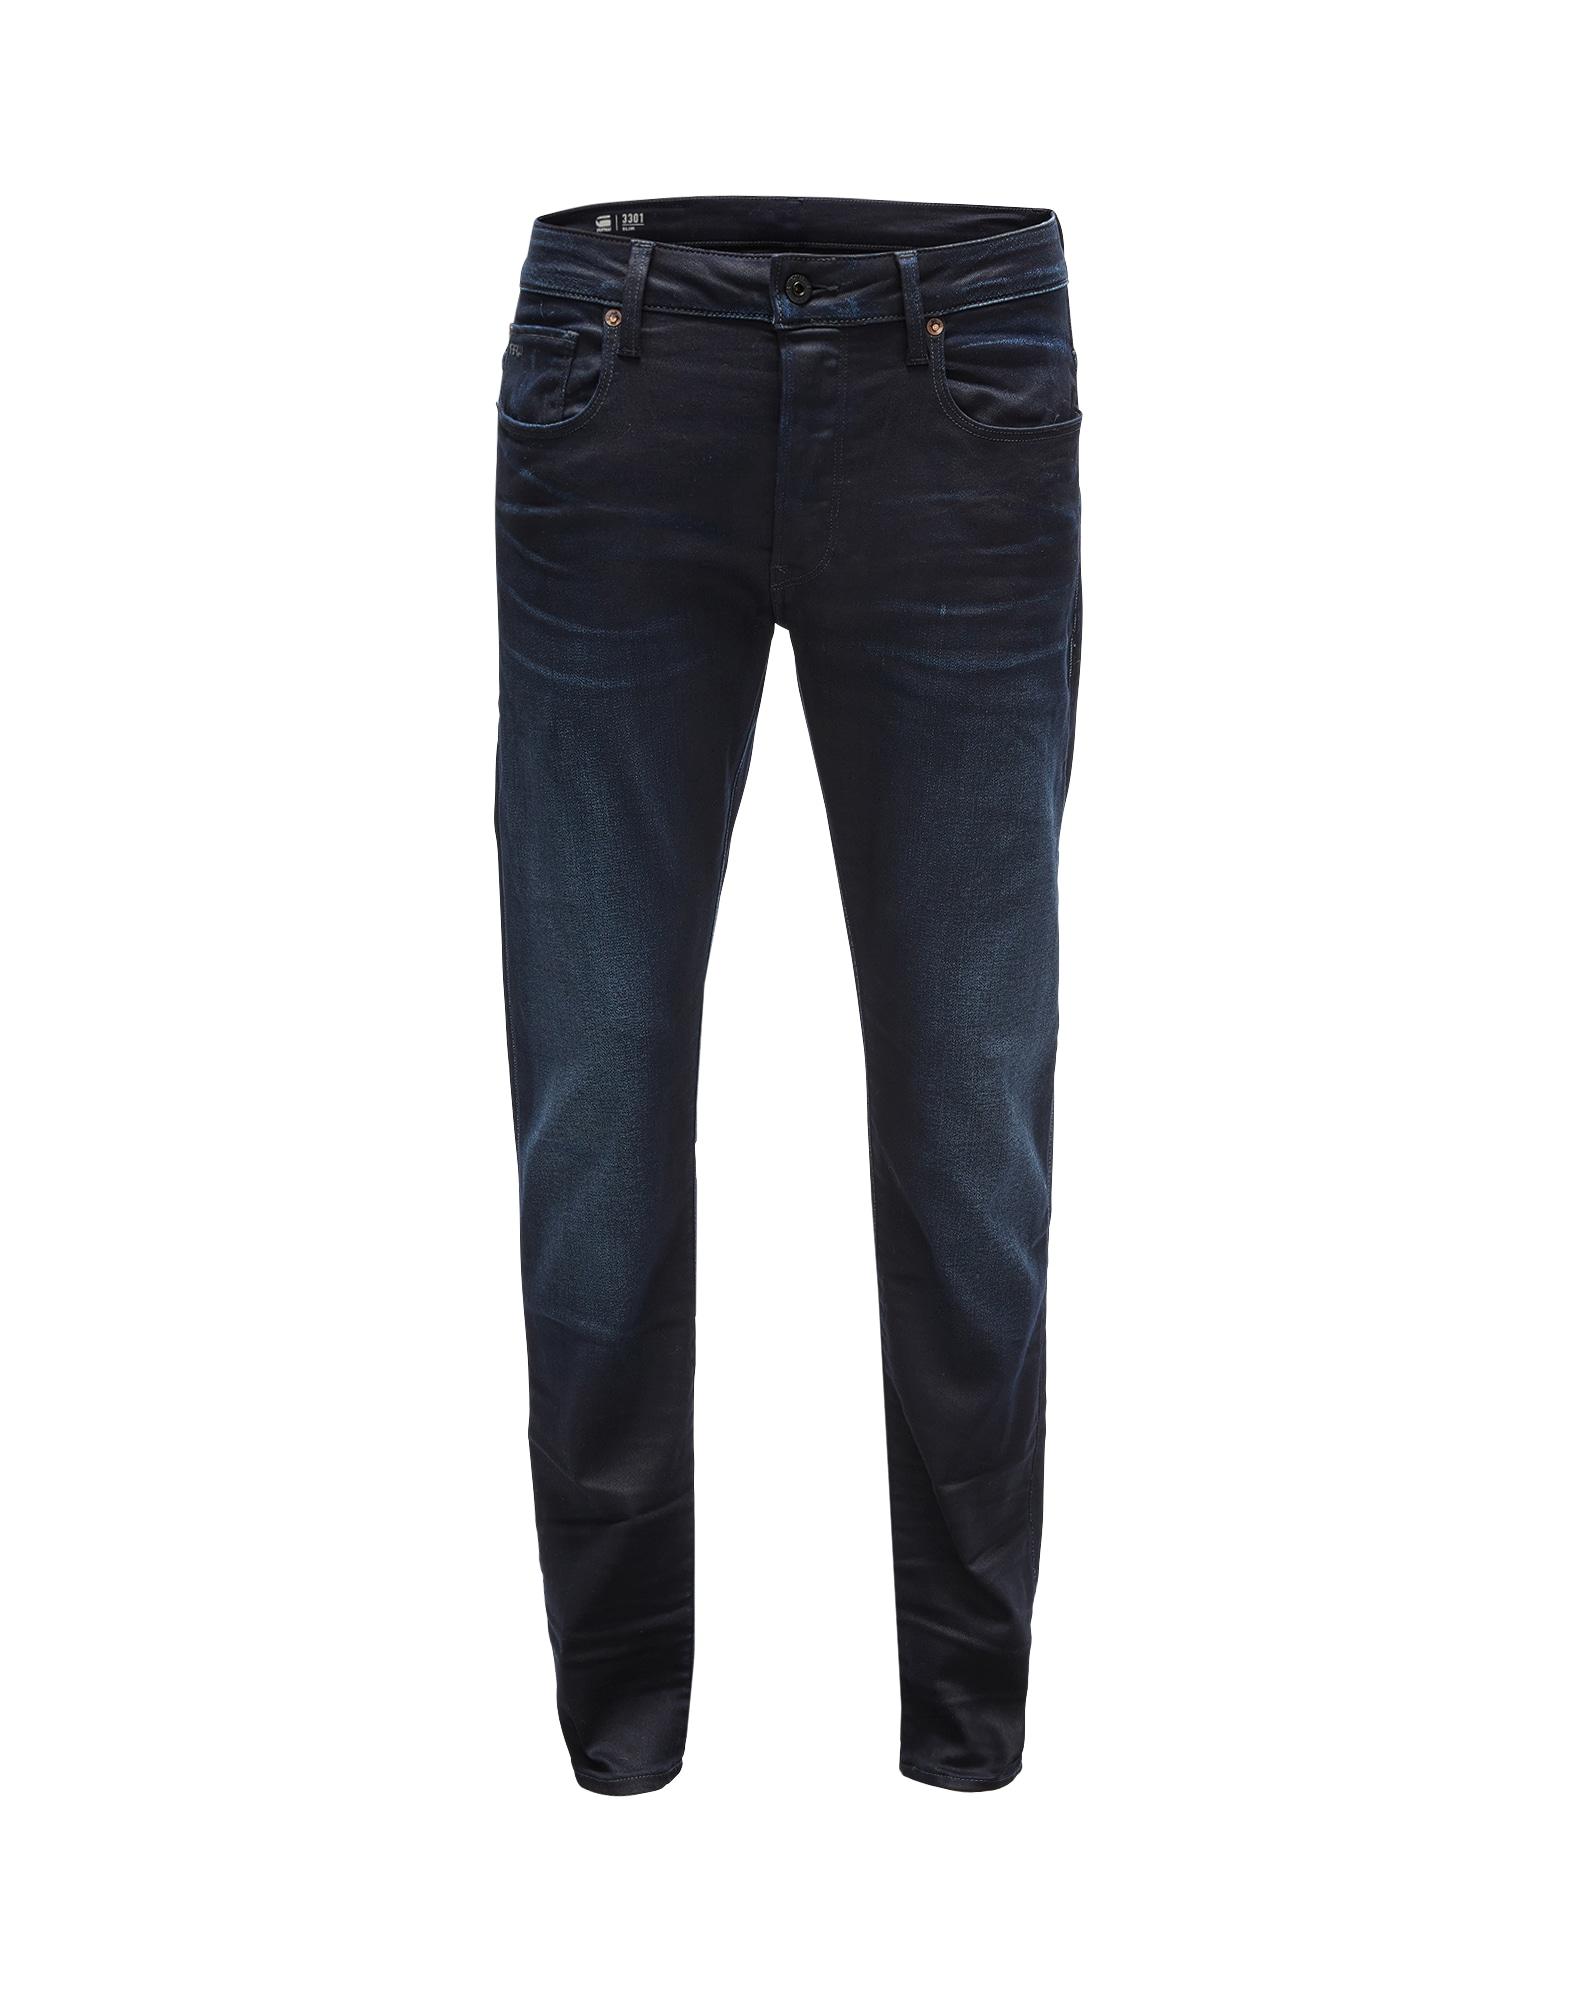 G-STAR RAW Heren Jeans black denim